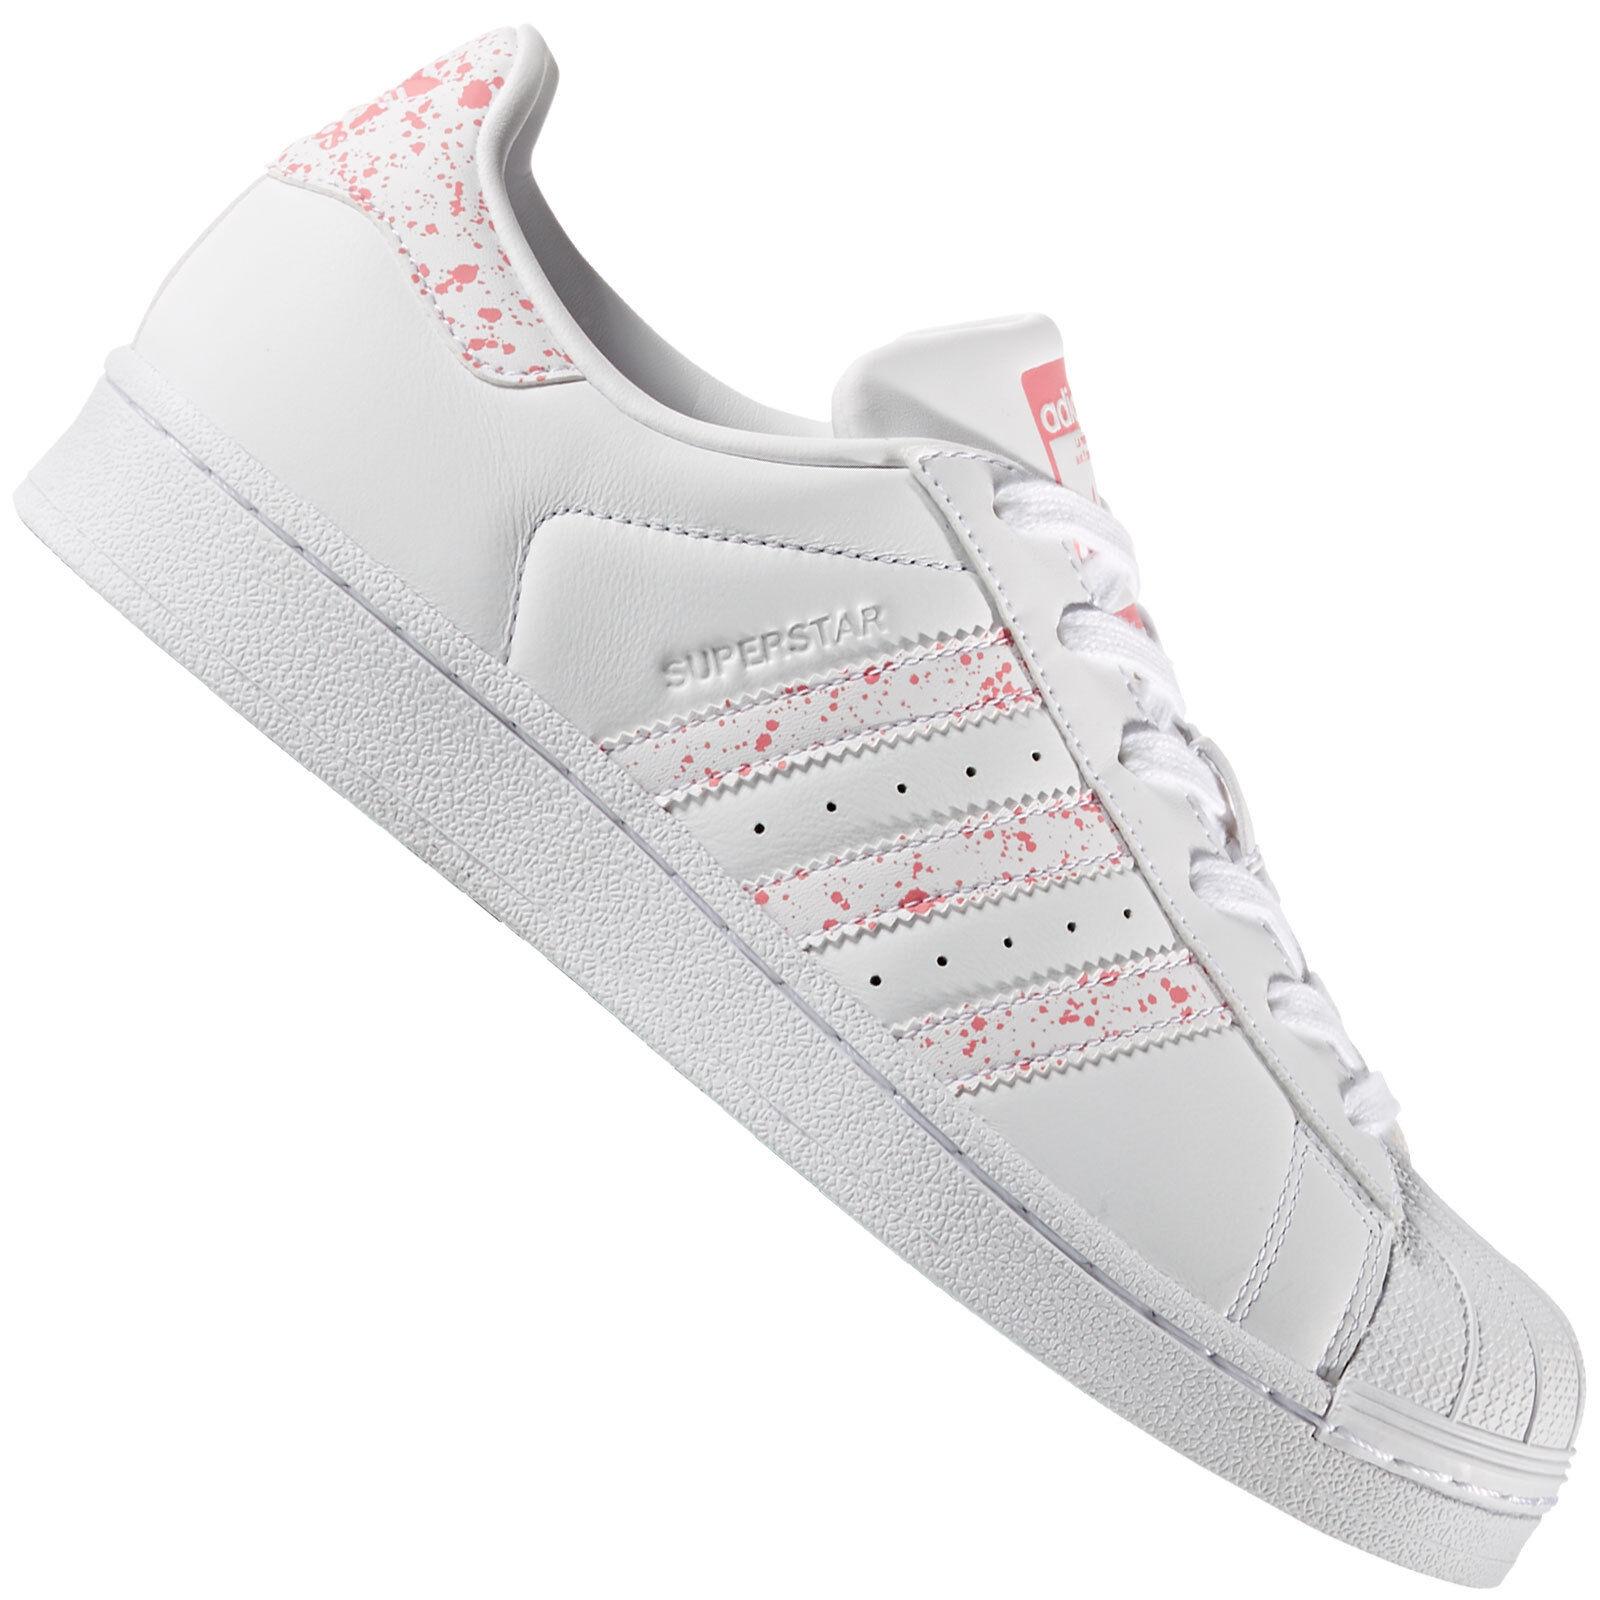 Chaussures Originals Superstar Femmes By2951 Baskets Sport Tactile Rose Adidas OPiuZkX